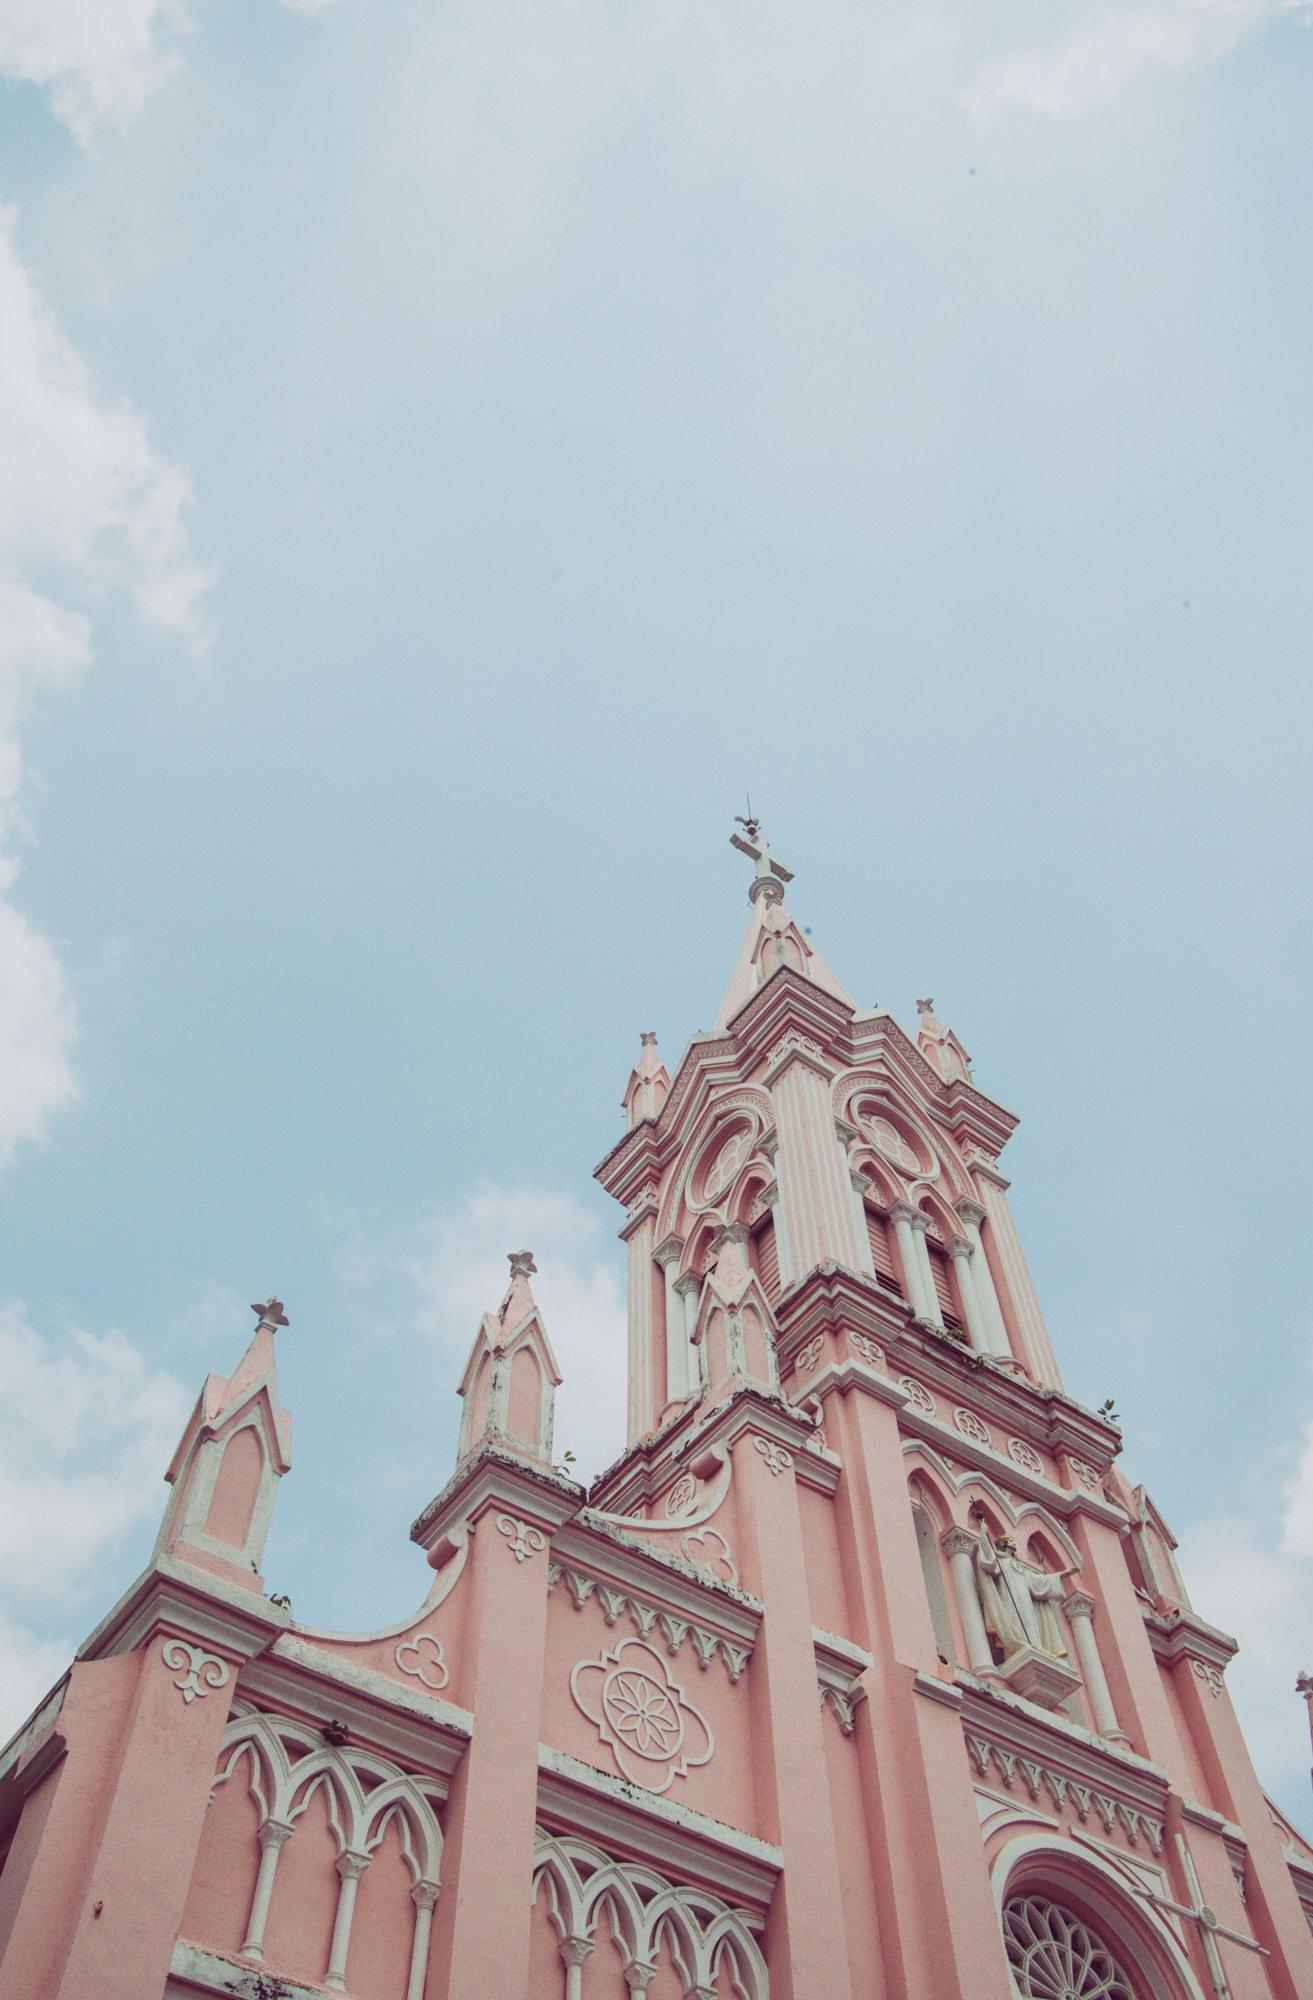 Da Nang Cathedral in Da Nang, Vietnam